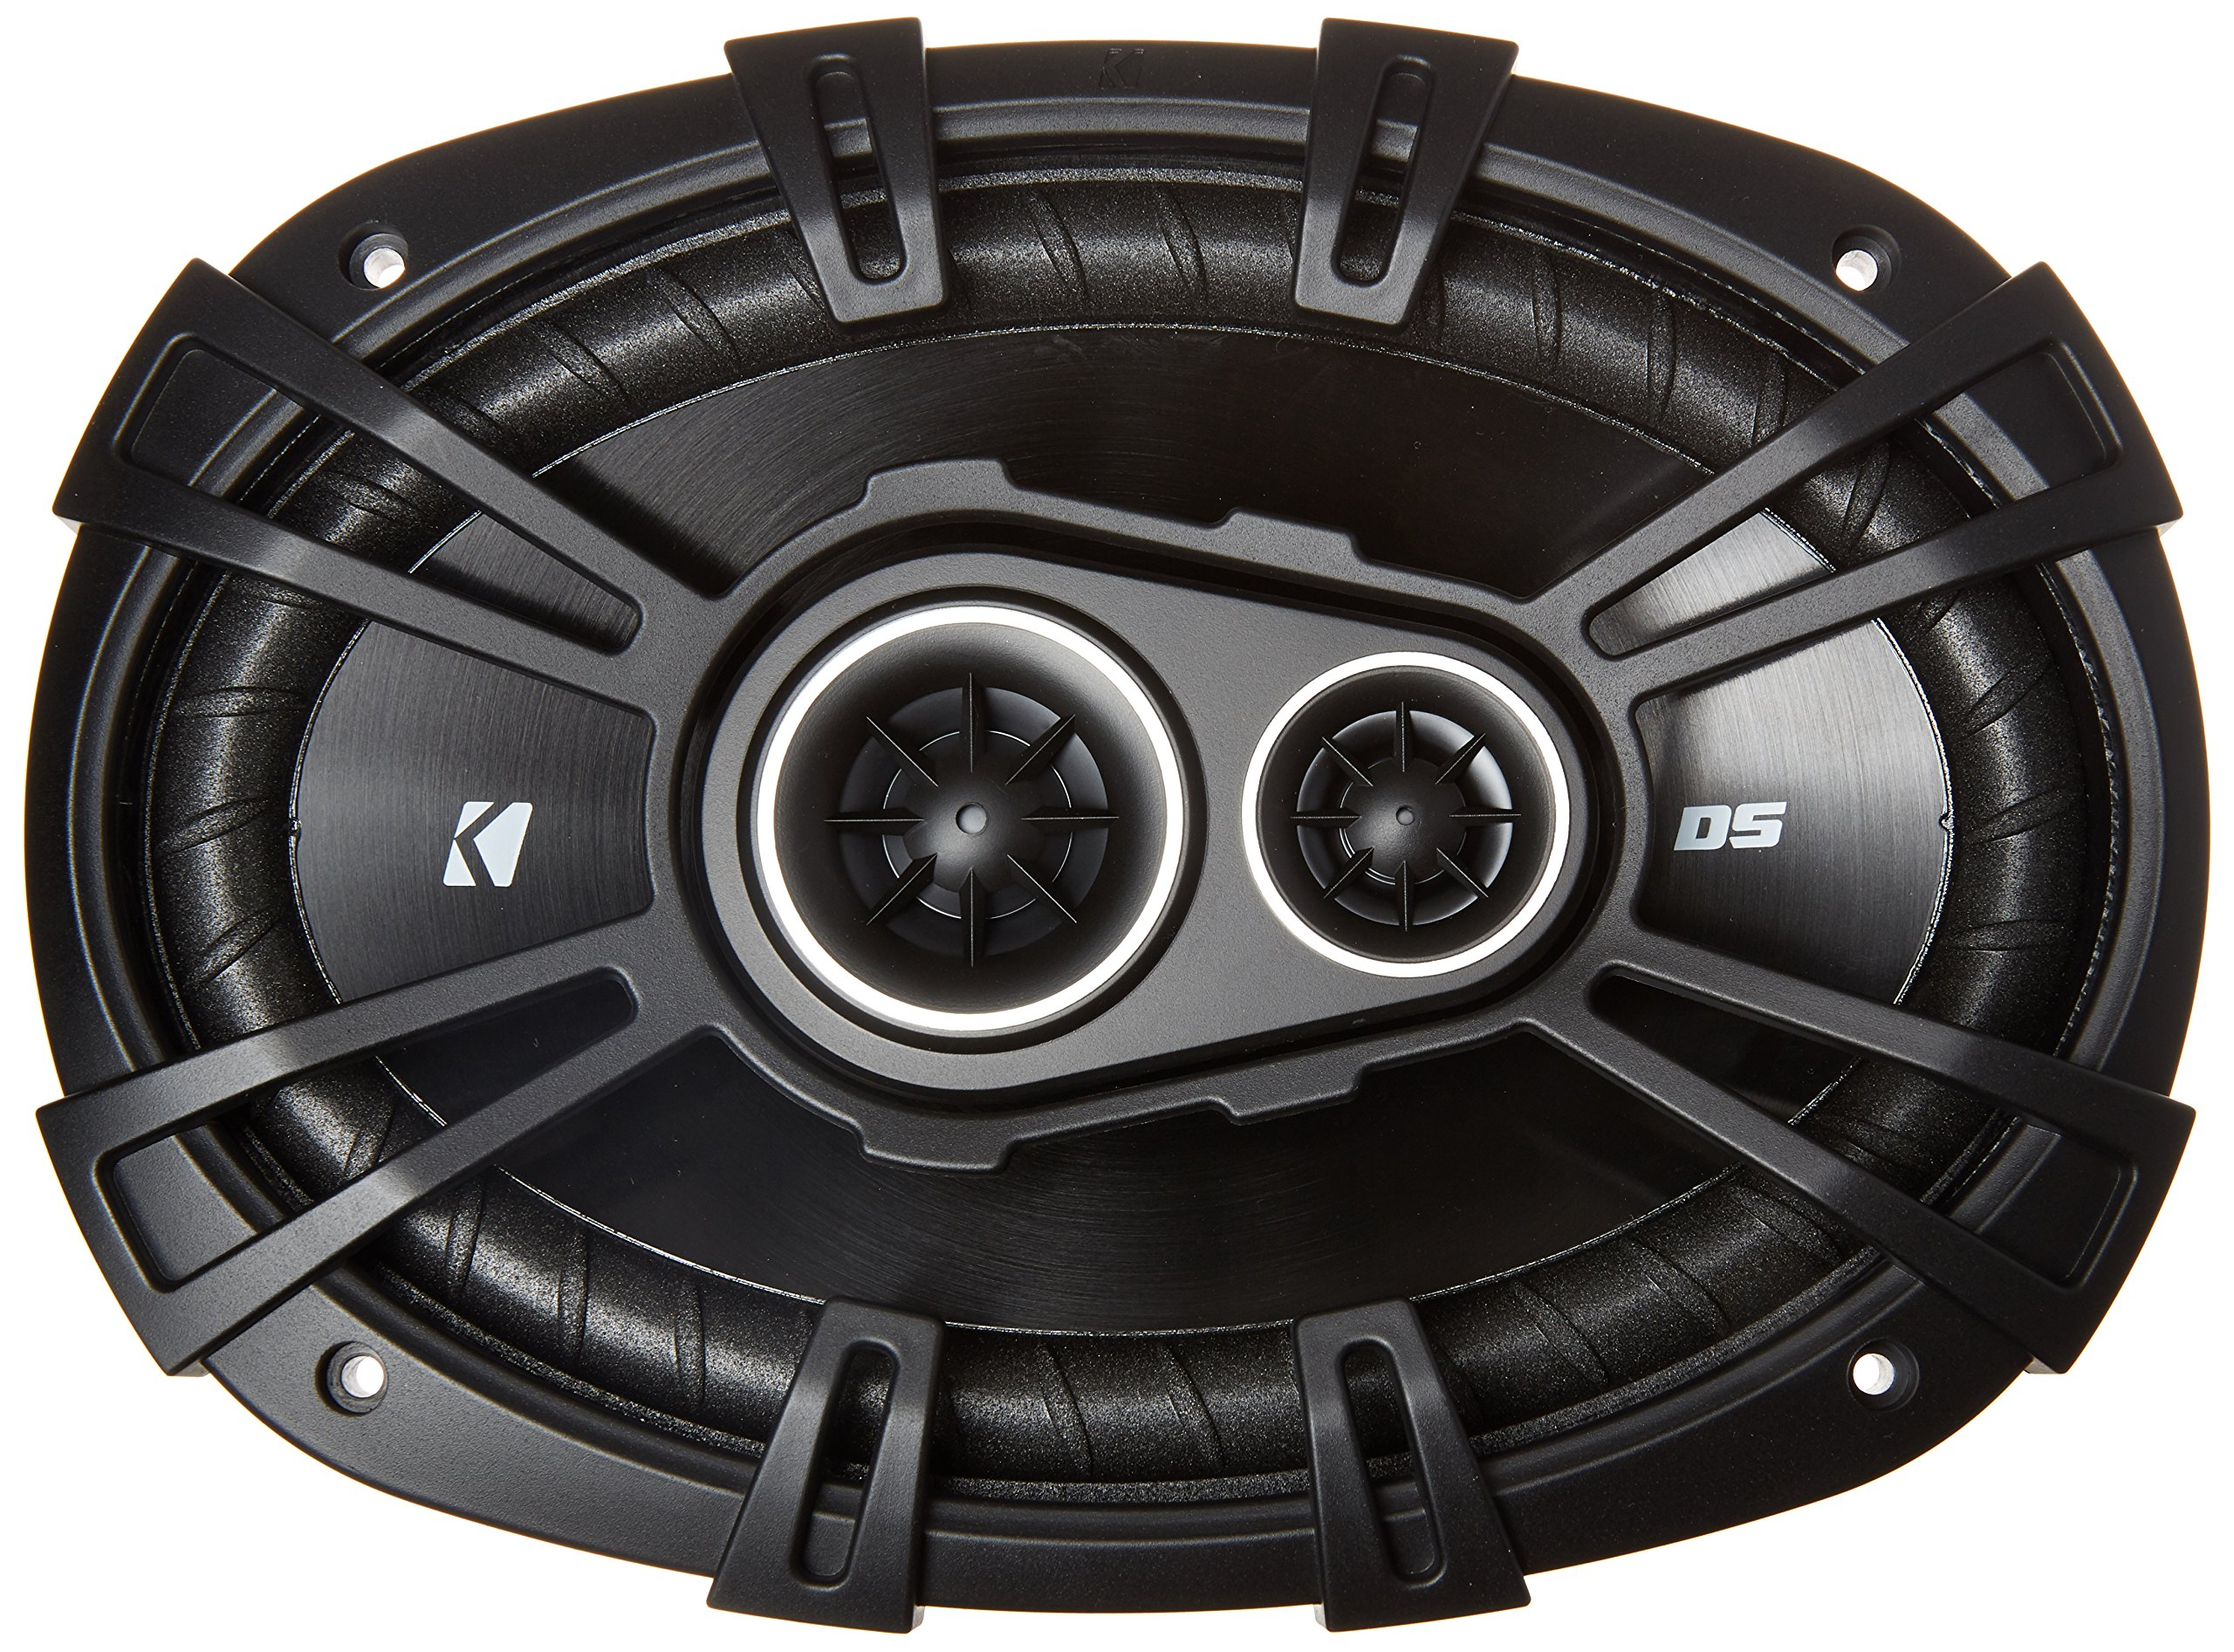 2) New Kicker 43DSC69304 D-Series 6x9'' 360 Watt 3-Way Car Audio Coaxial Speakers